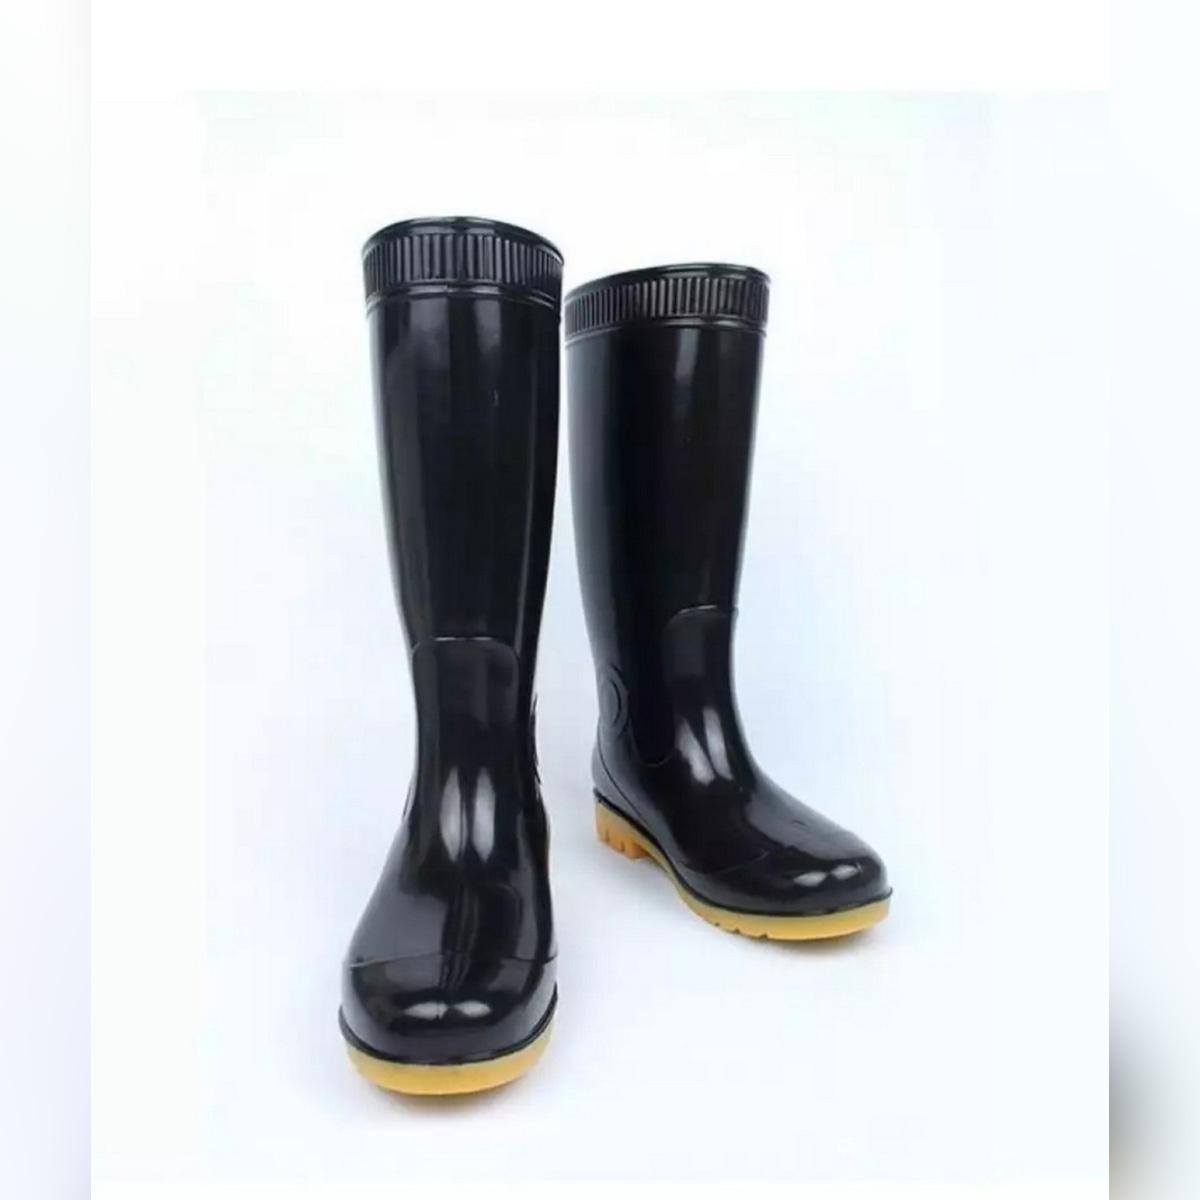 ONE PAIR BLACK RUBBER RAIN BOOTS FOR MEN&WOMEN